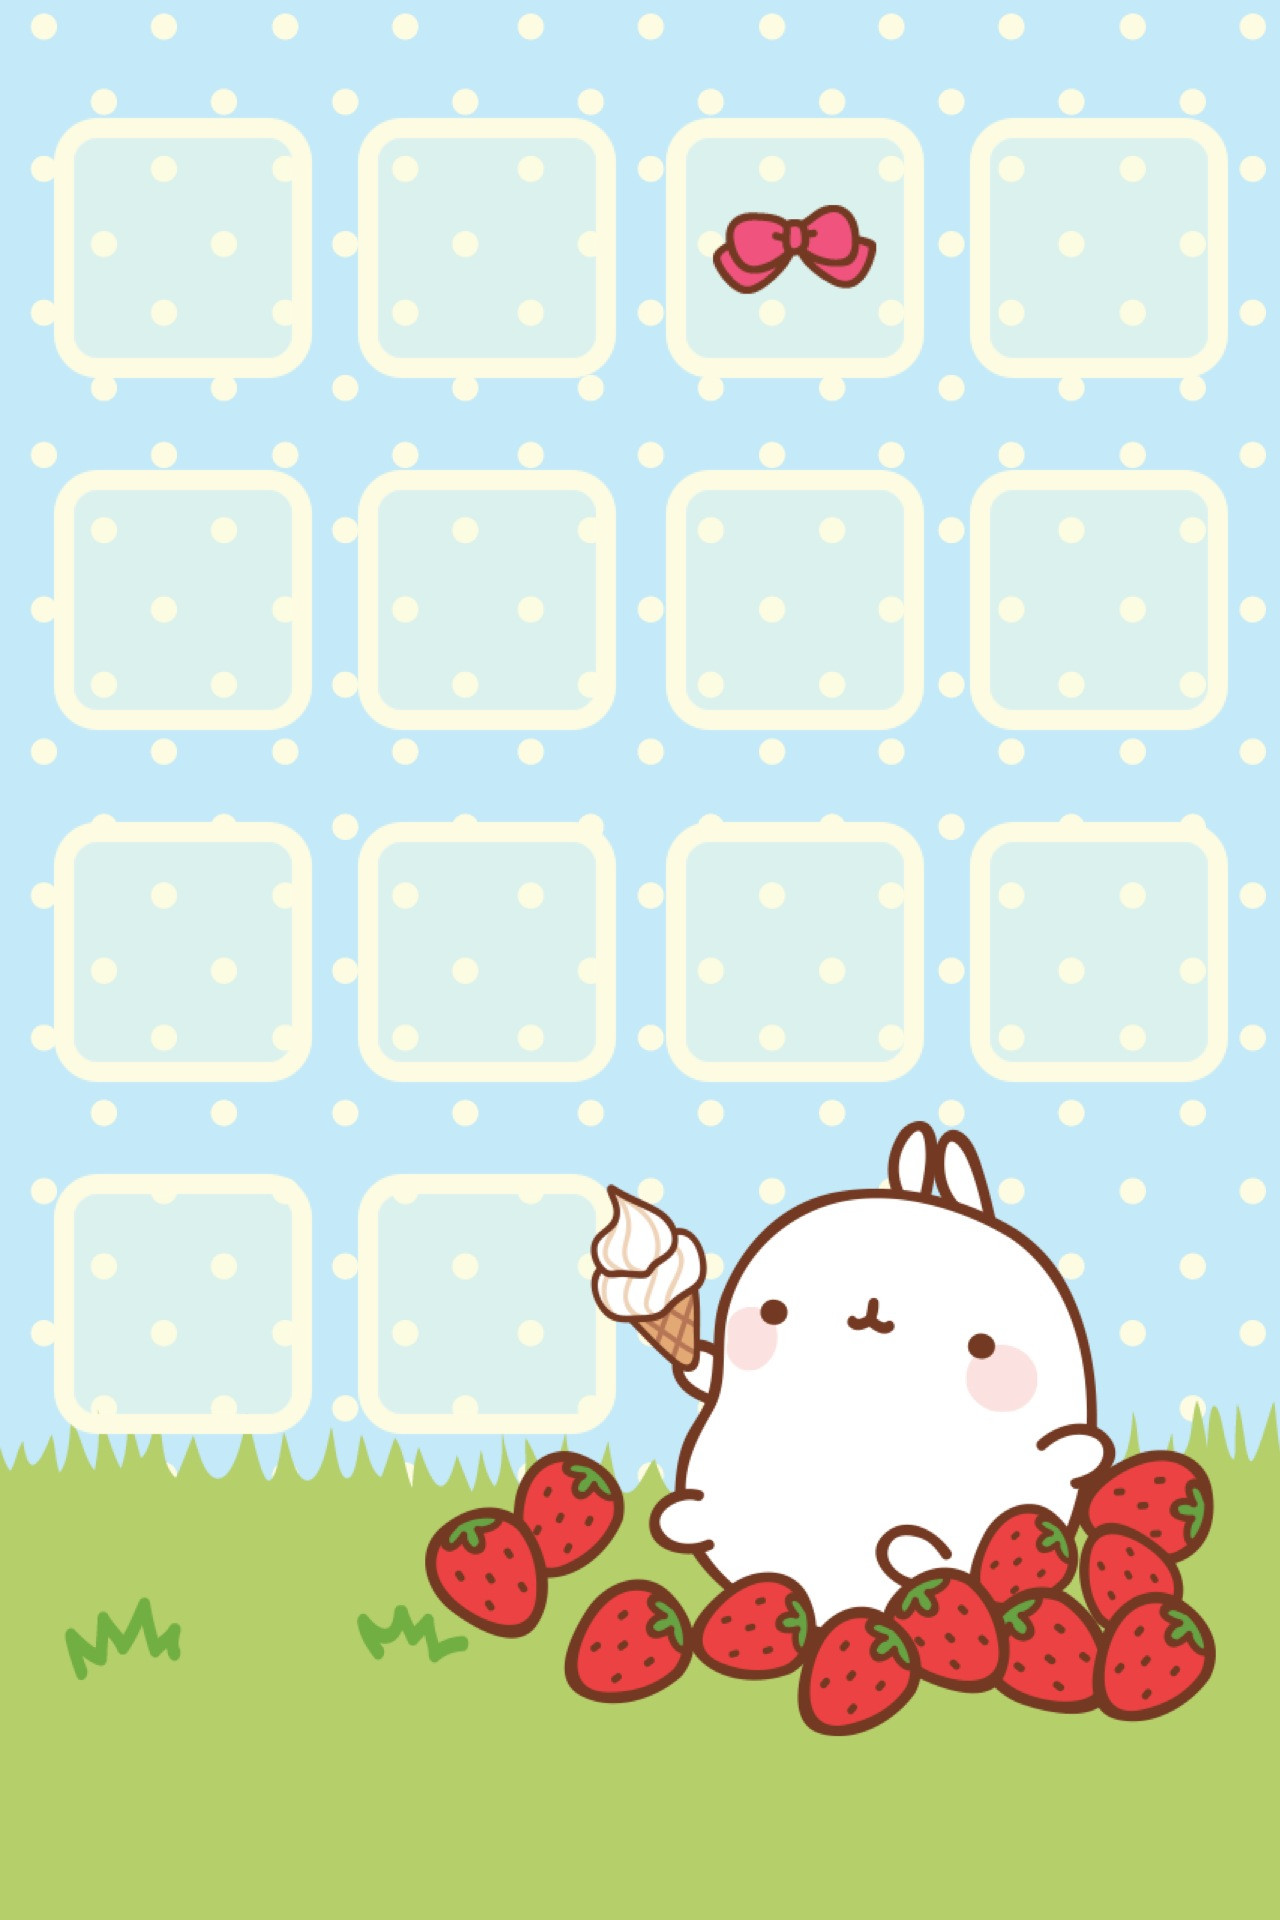 Cute home screen Kawaii wallpaper